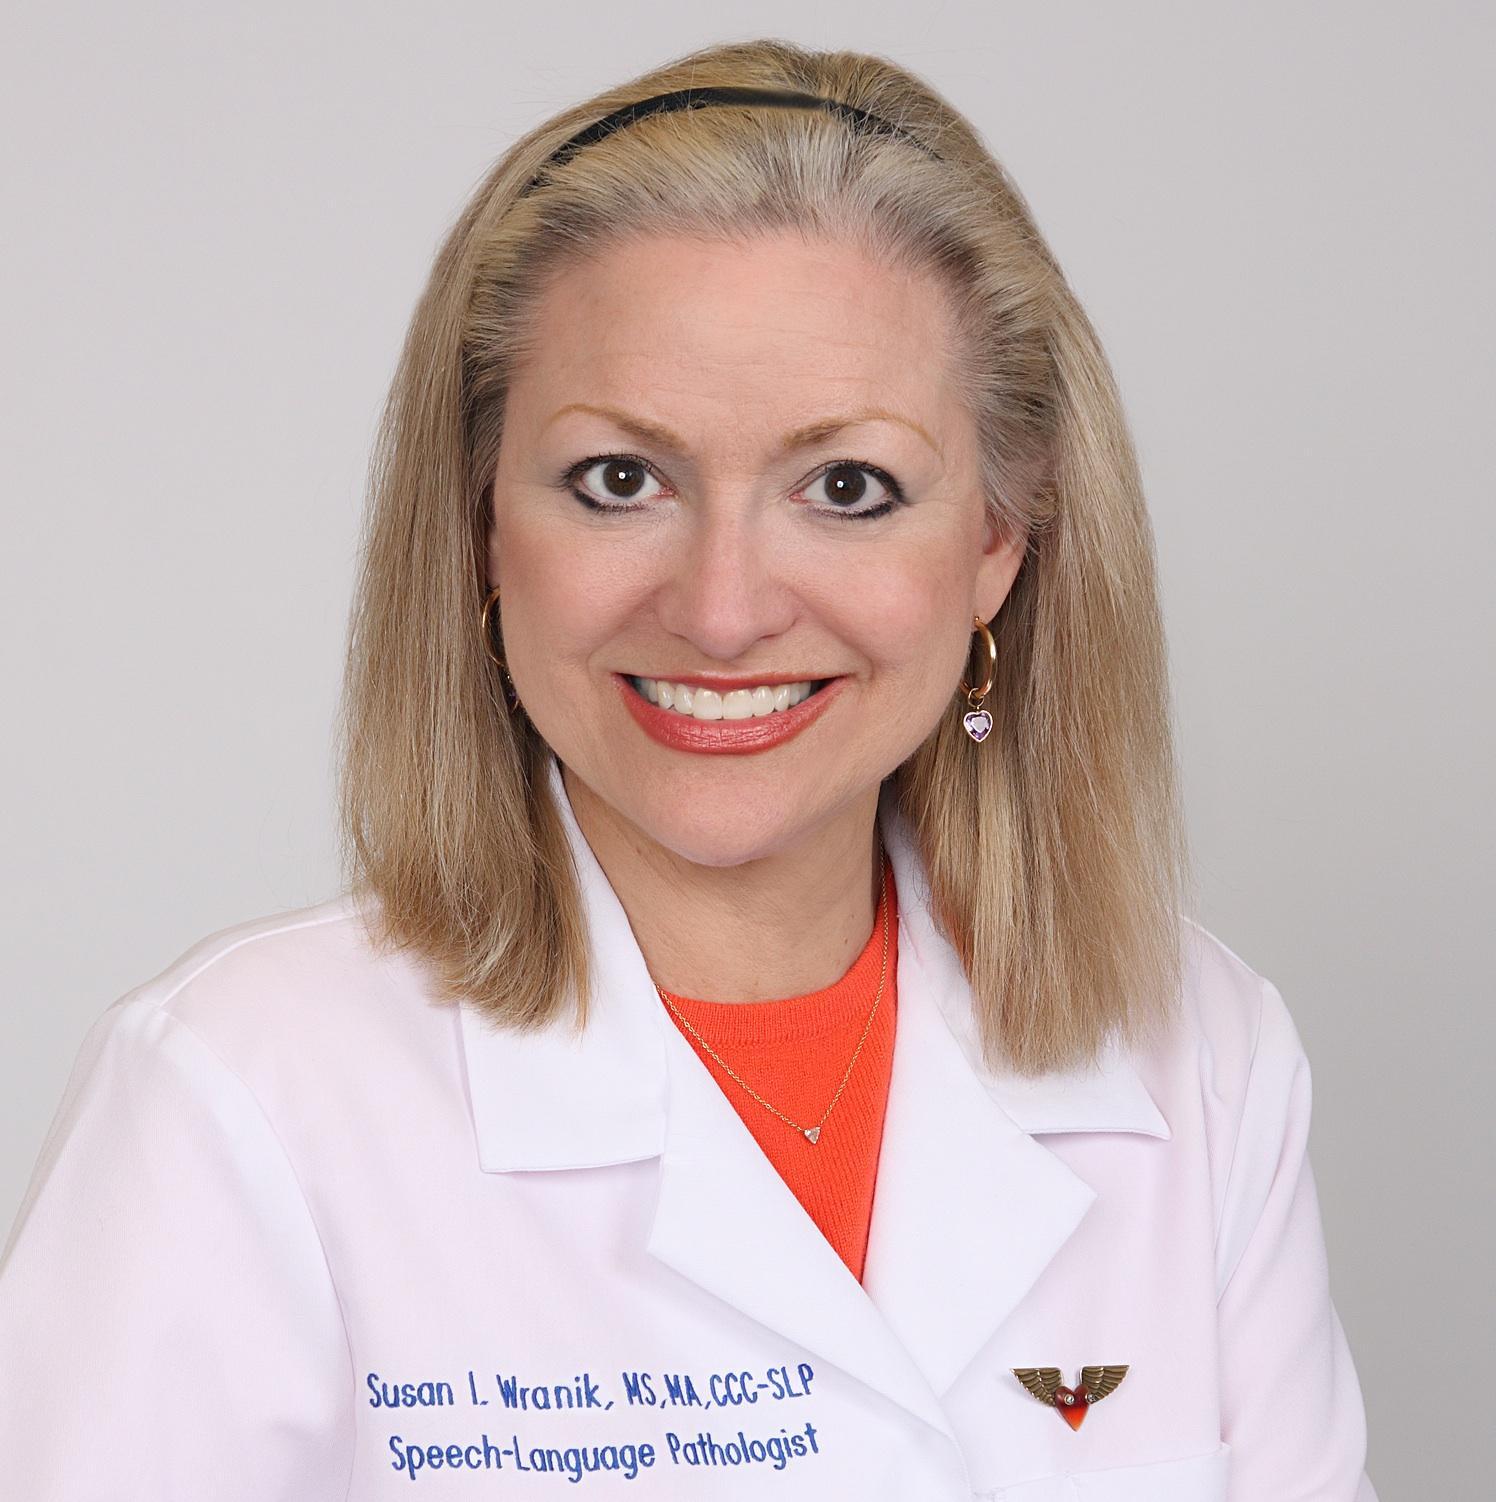 Susan I. Wranik, MS, MA, CCC-SLP